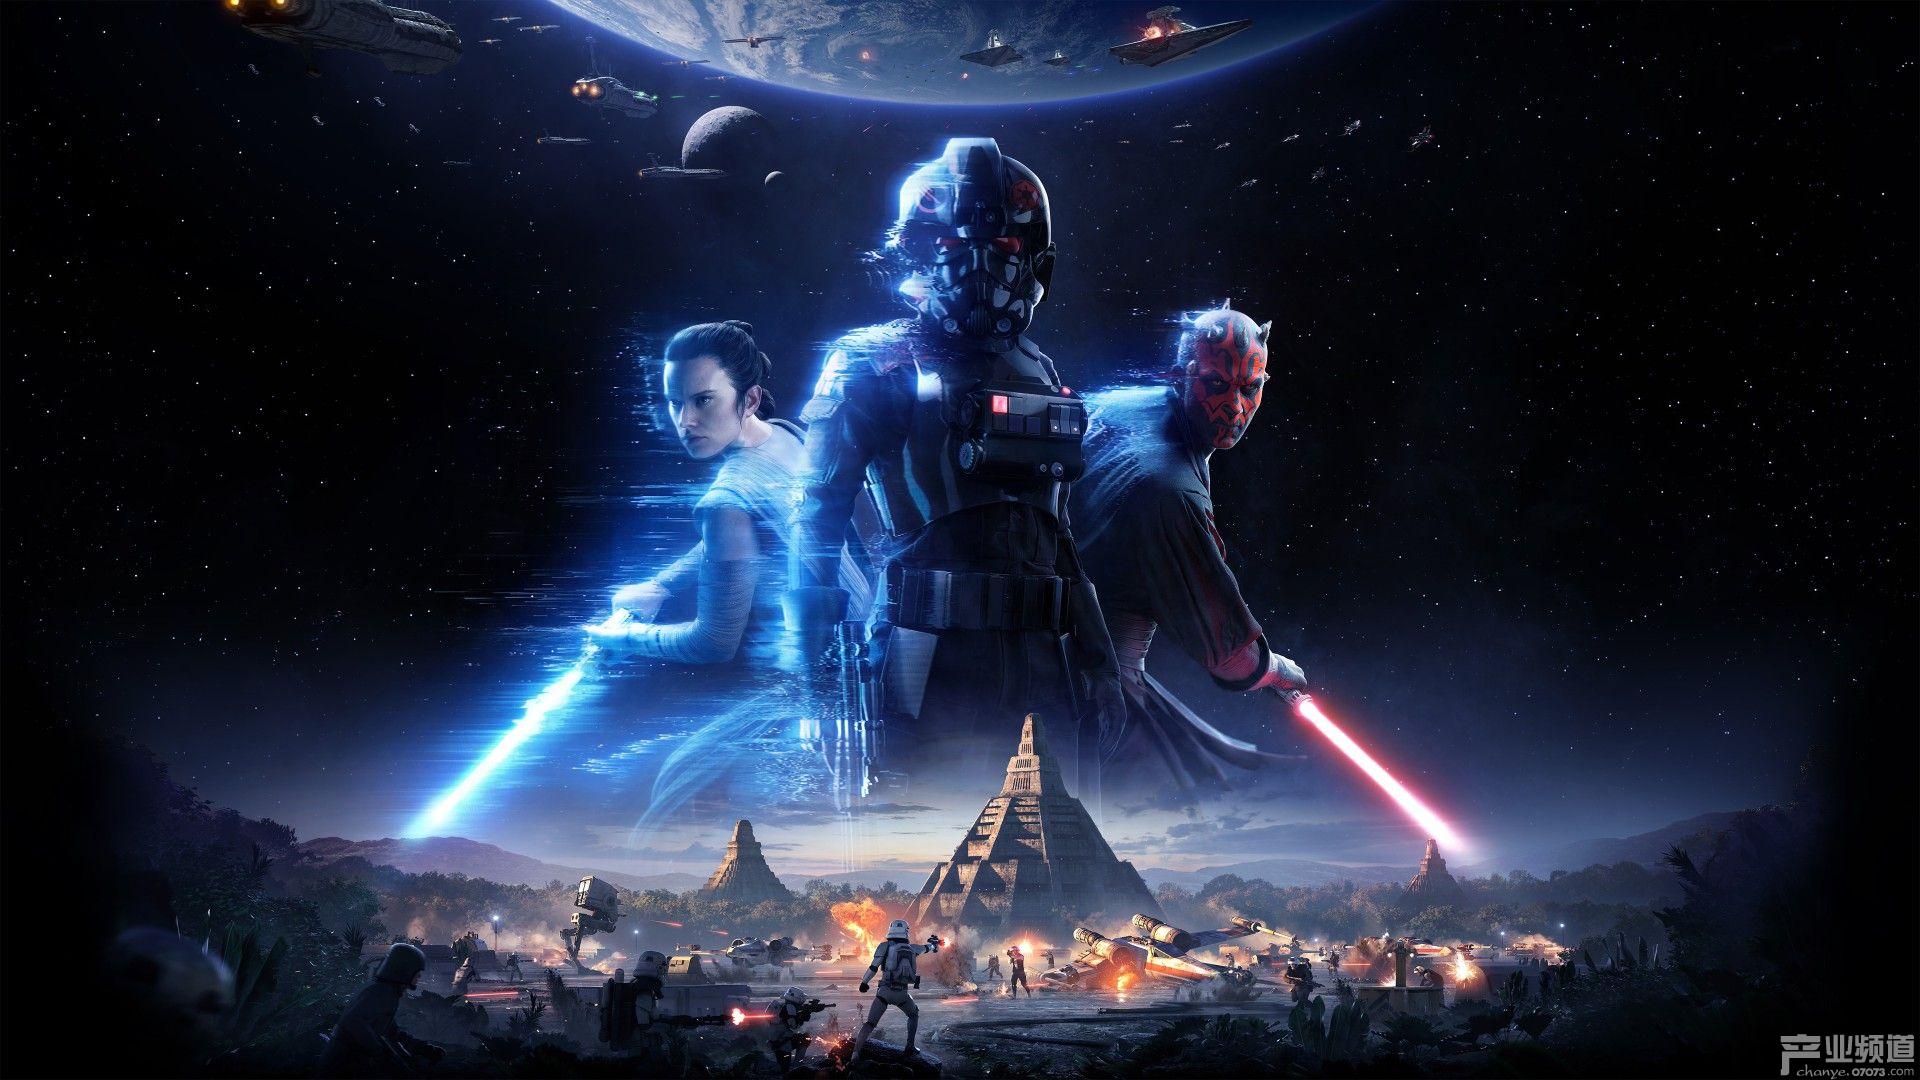 B社成为2017年全球评价最高游戏发行商 EA垫底